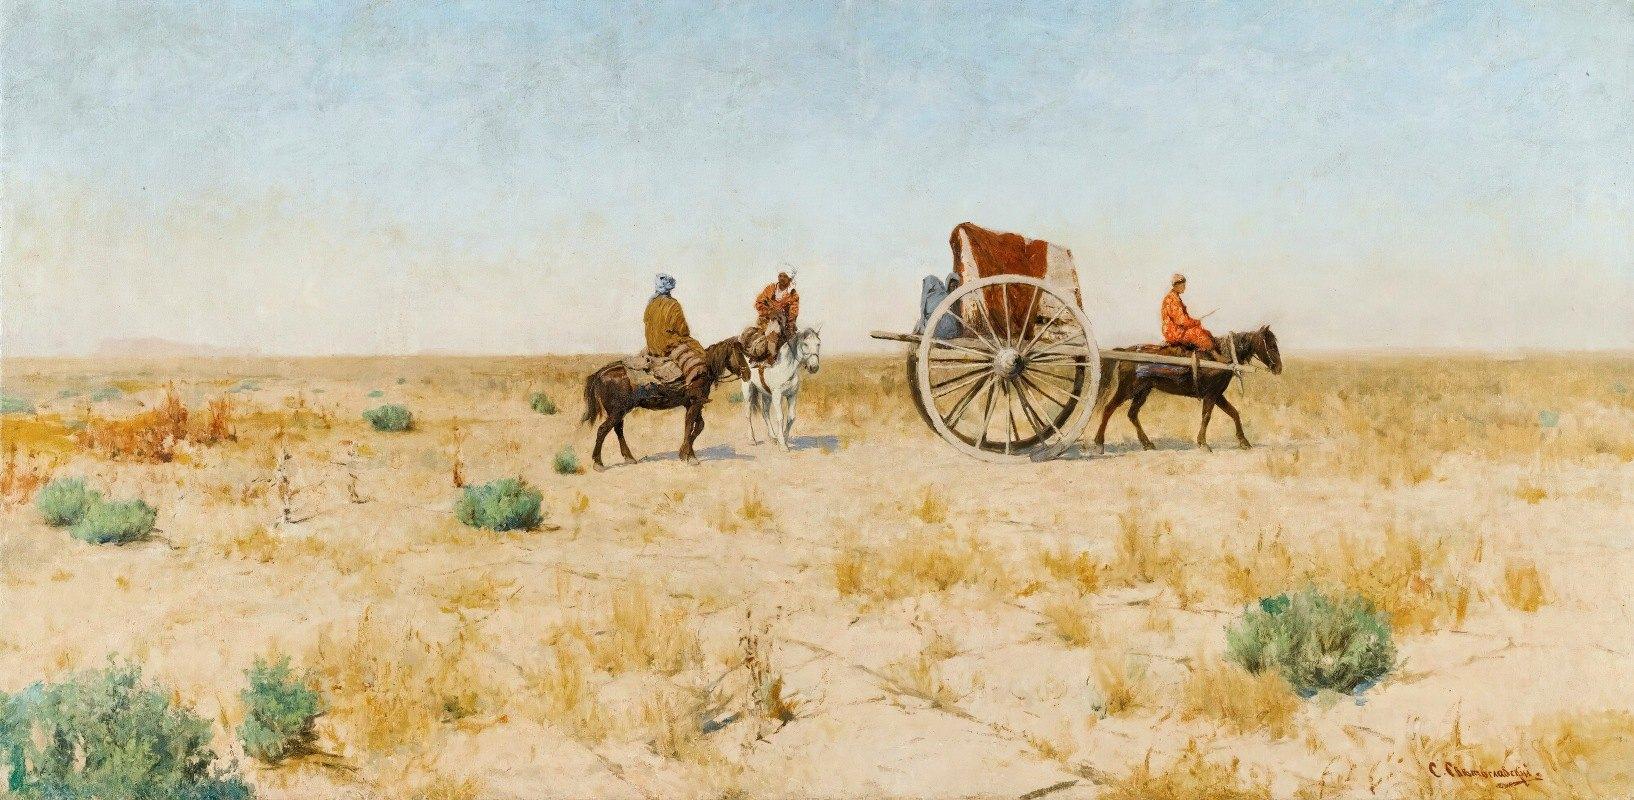 Sergei Ivanovich Svetoslavsky - The Journey